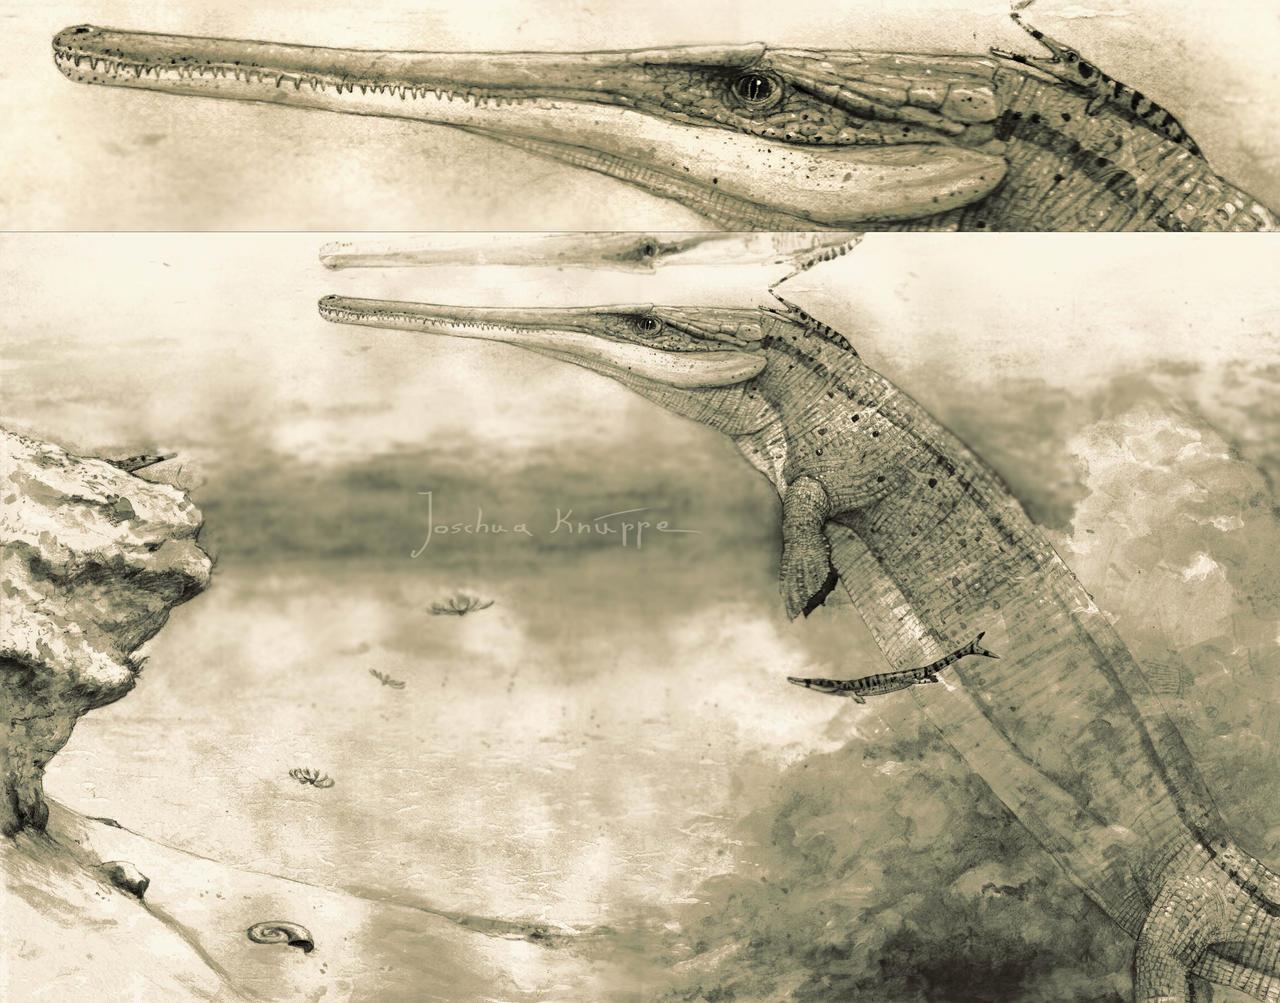 Cricosaurus